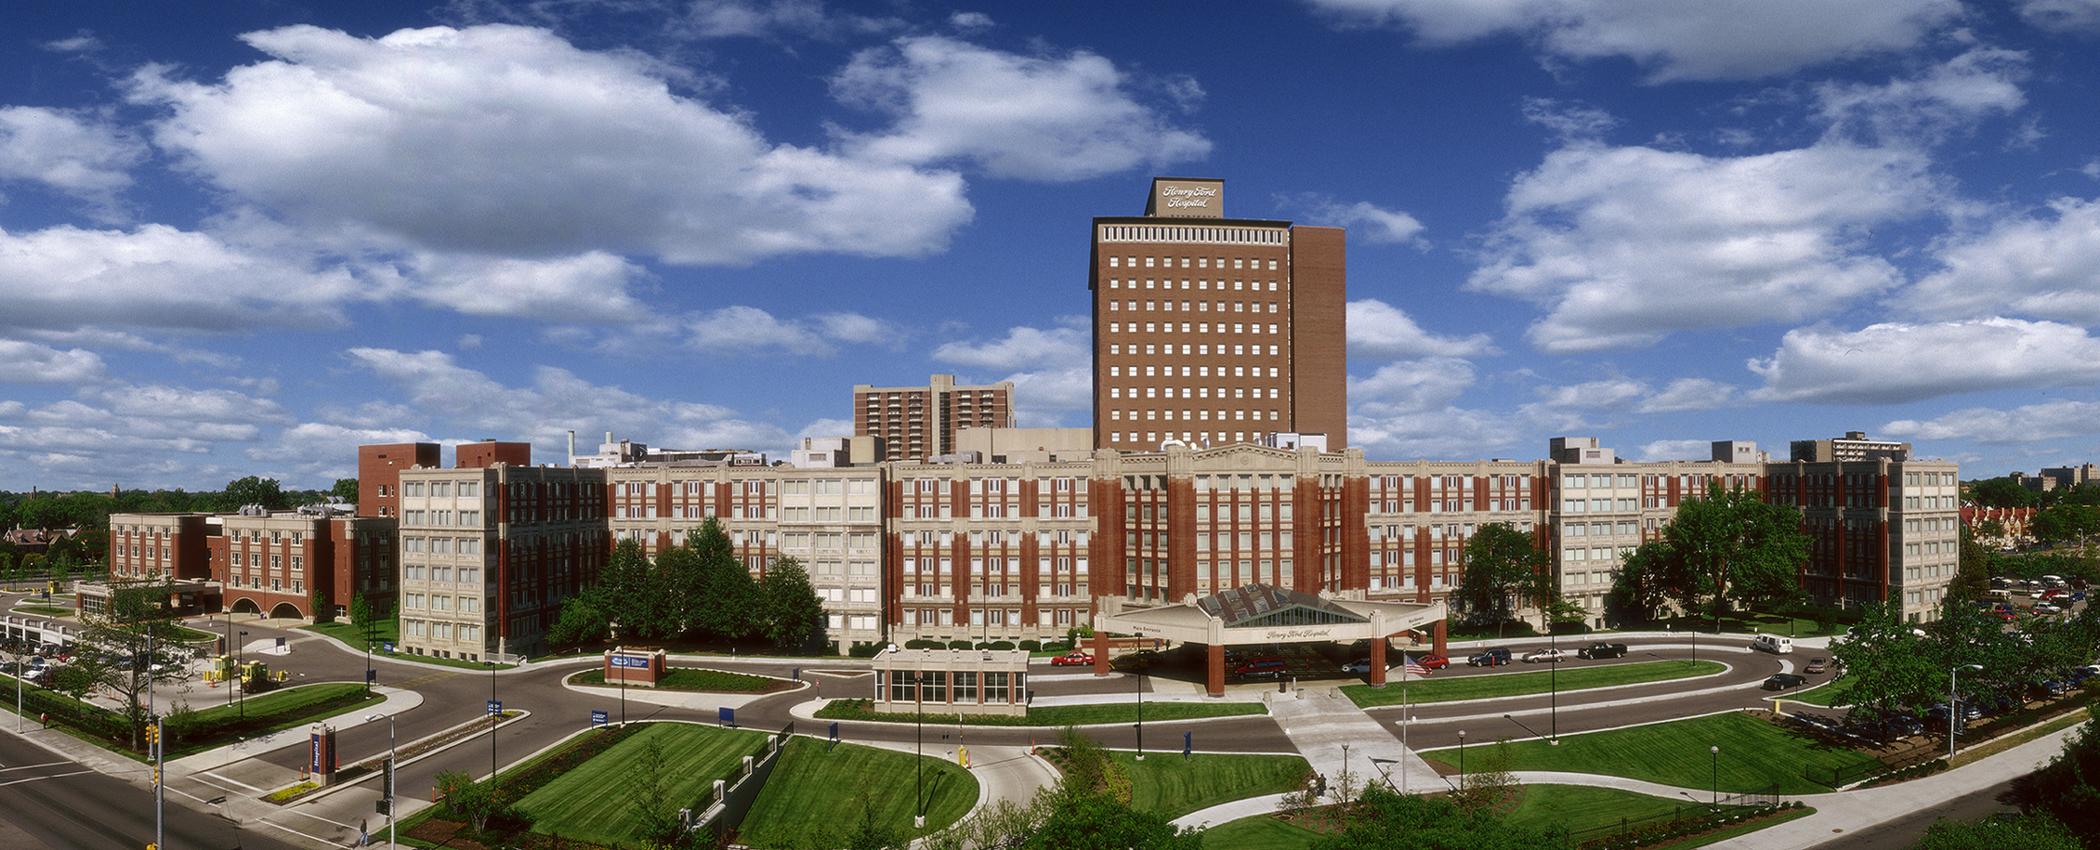 Detroit Hospital